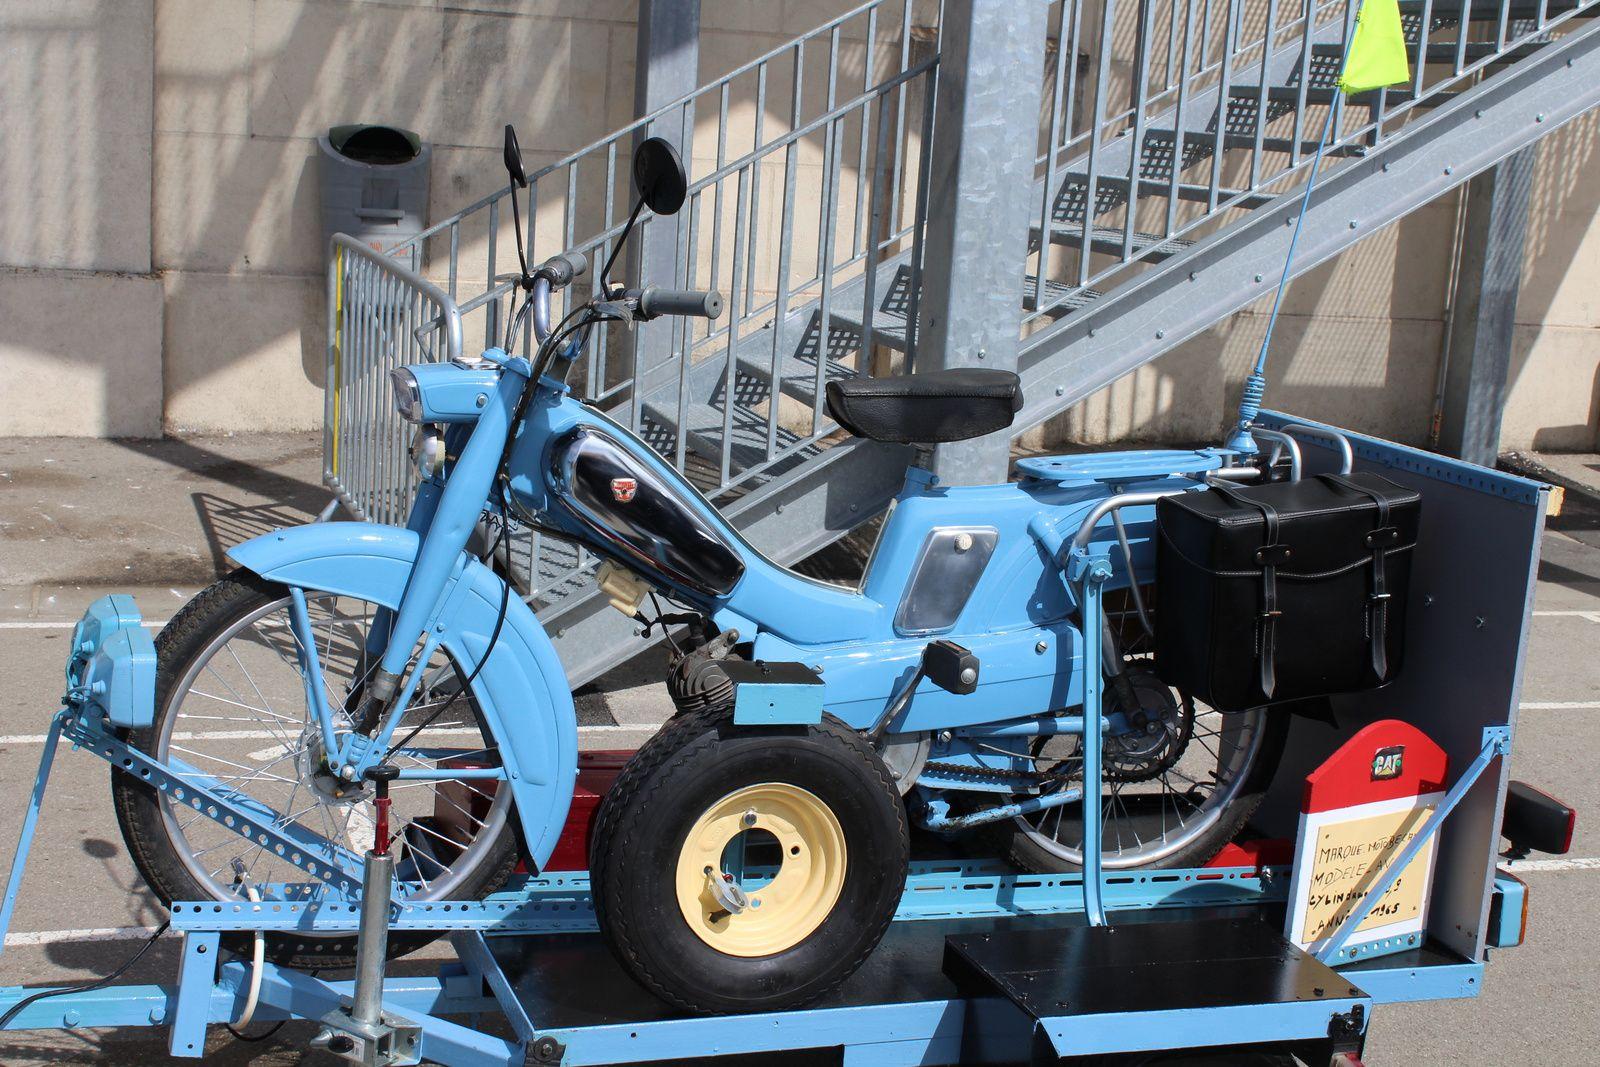 Tracteurs en weppes, Beaucamps-ligny 2017